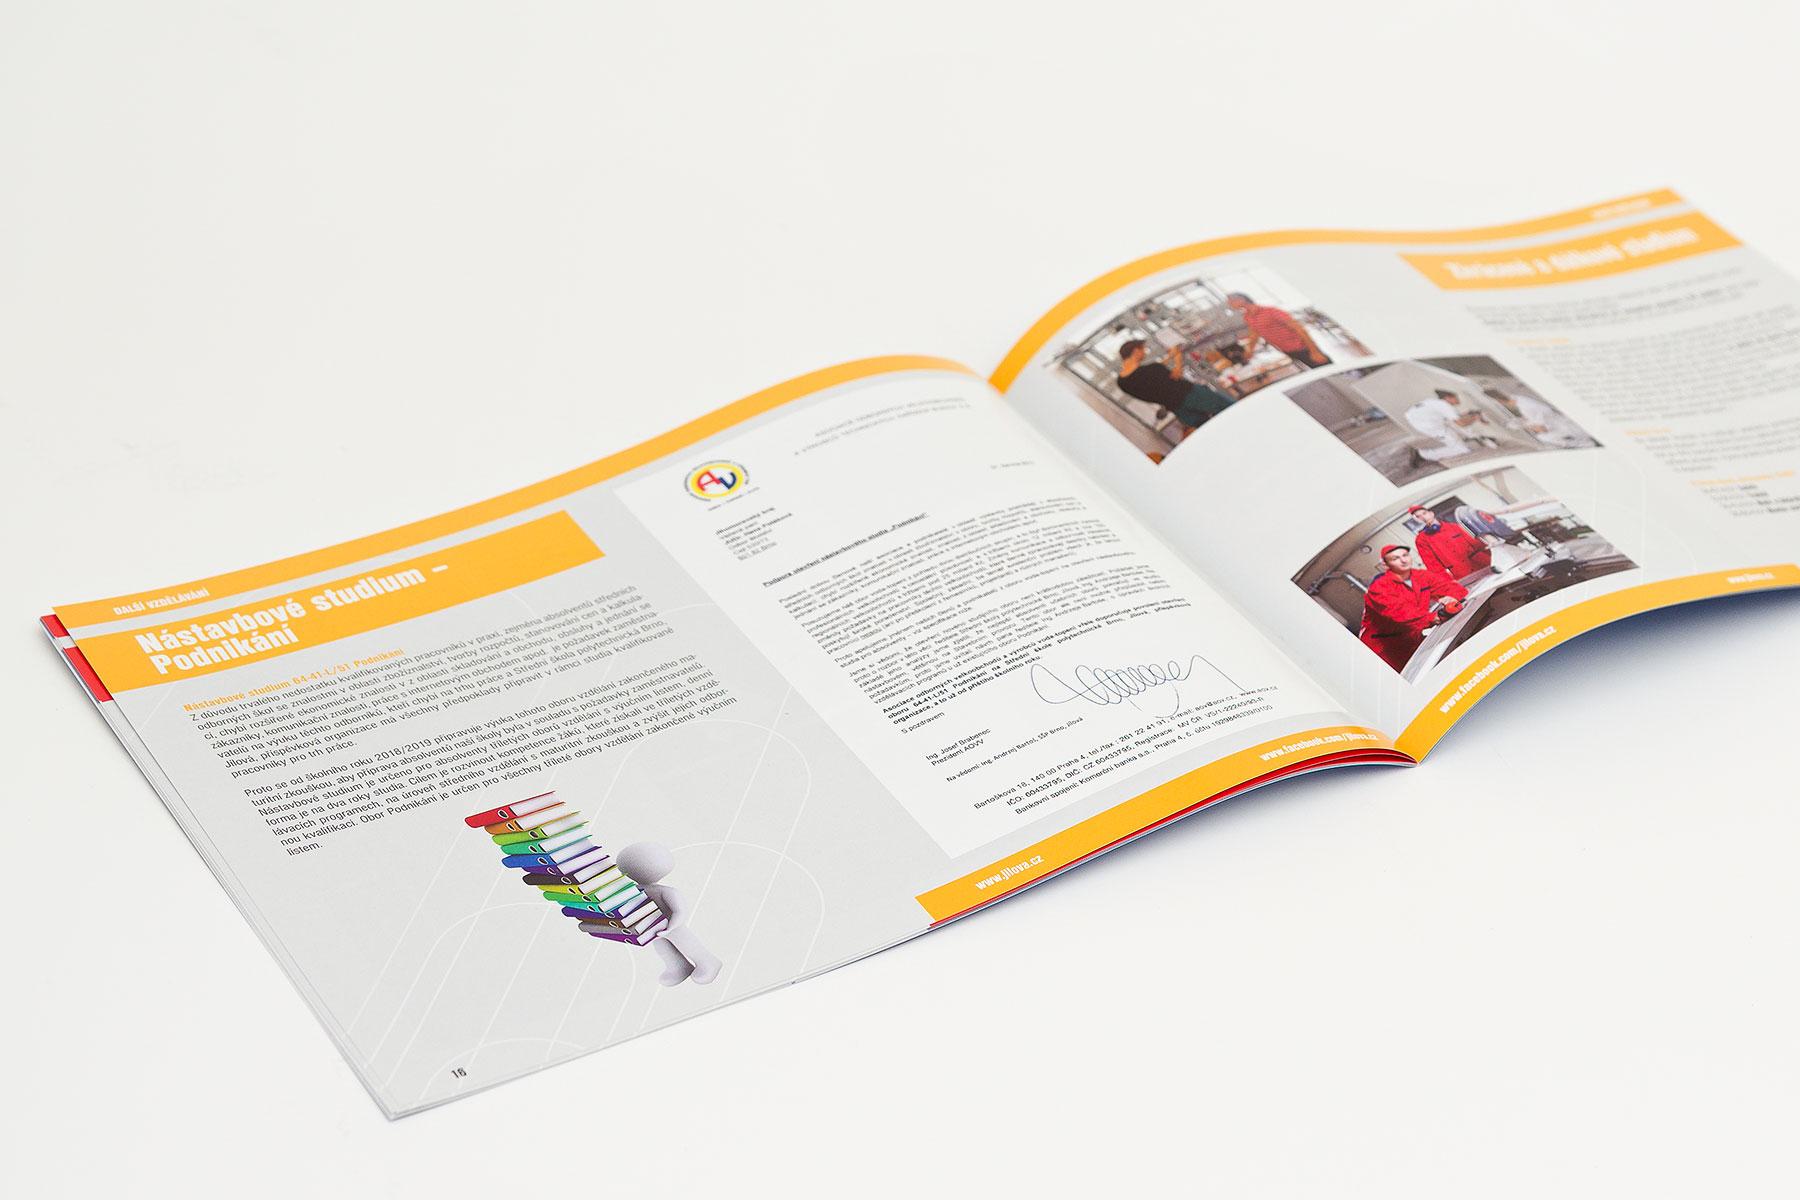 Brožura studijních oborů